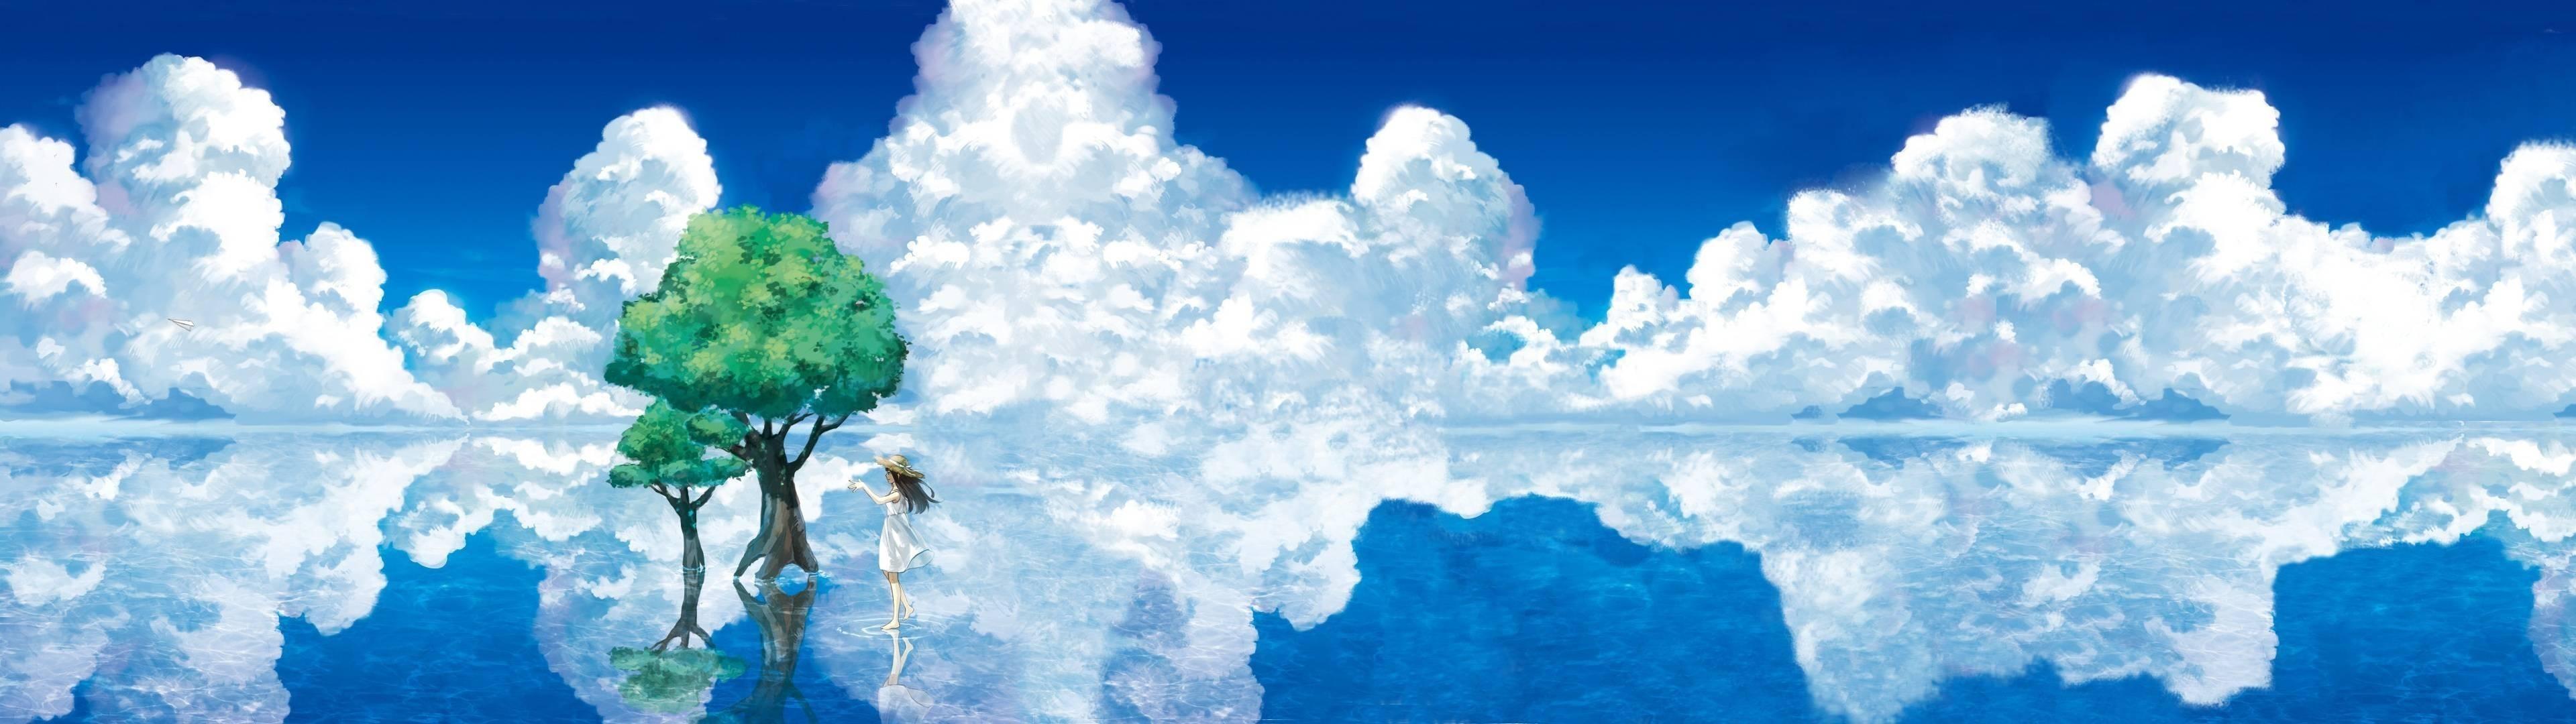 anime landscape dual screen wallpaper 3840×1080